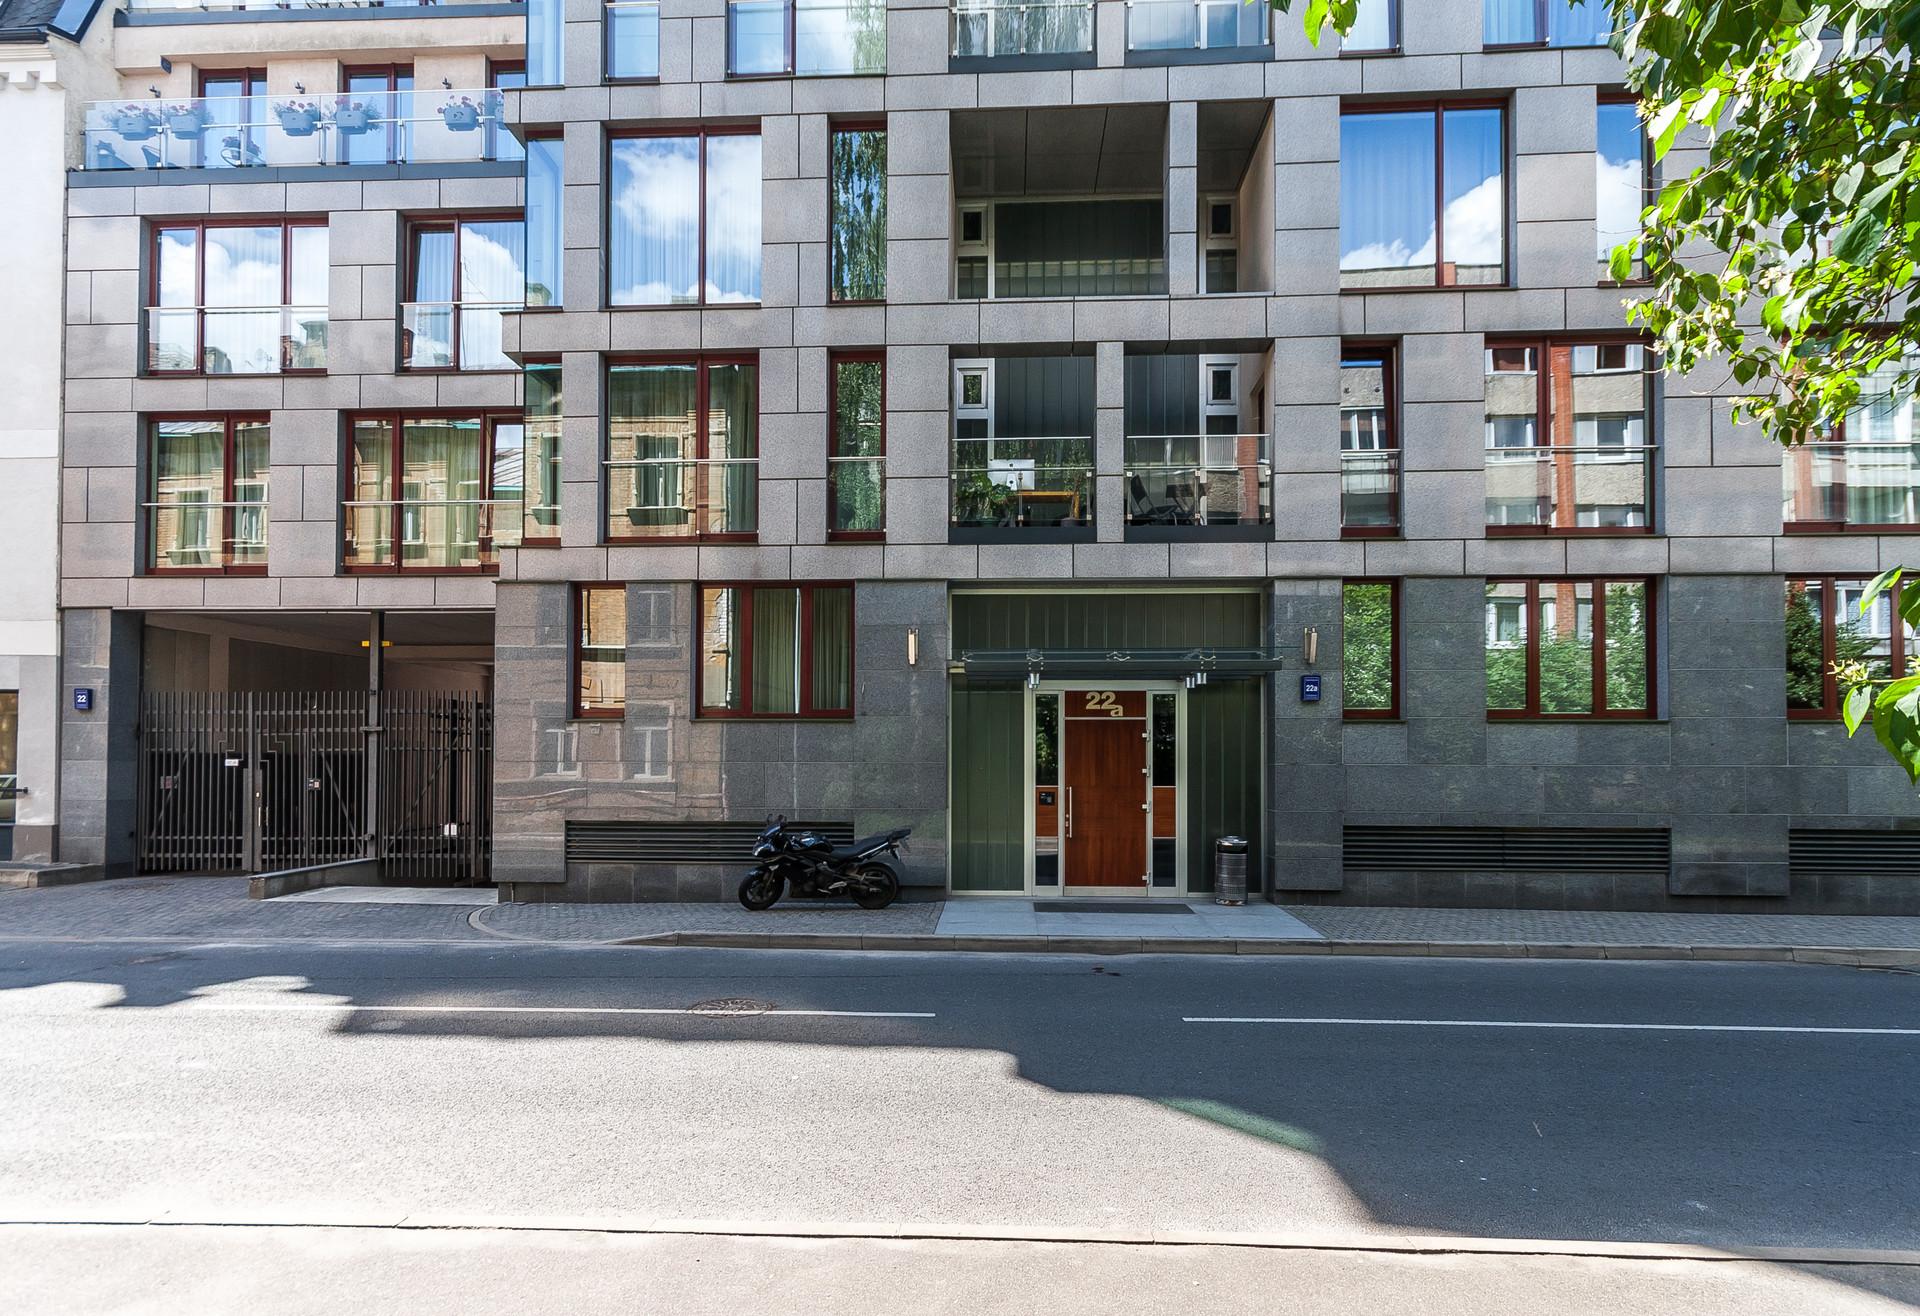 spacios-2-bedroom-apartment-terrace-center-riga-6b16a1104f16e1fe9e00742cffc91ac8